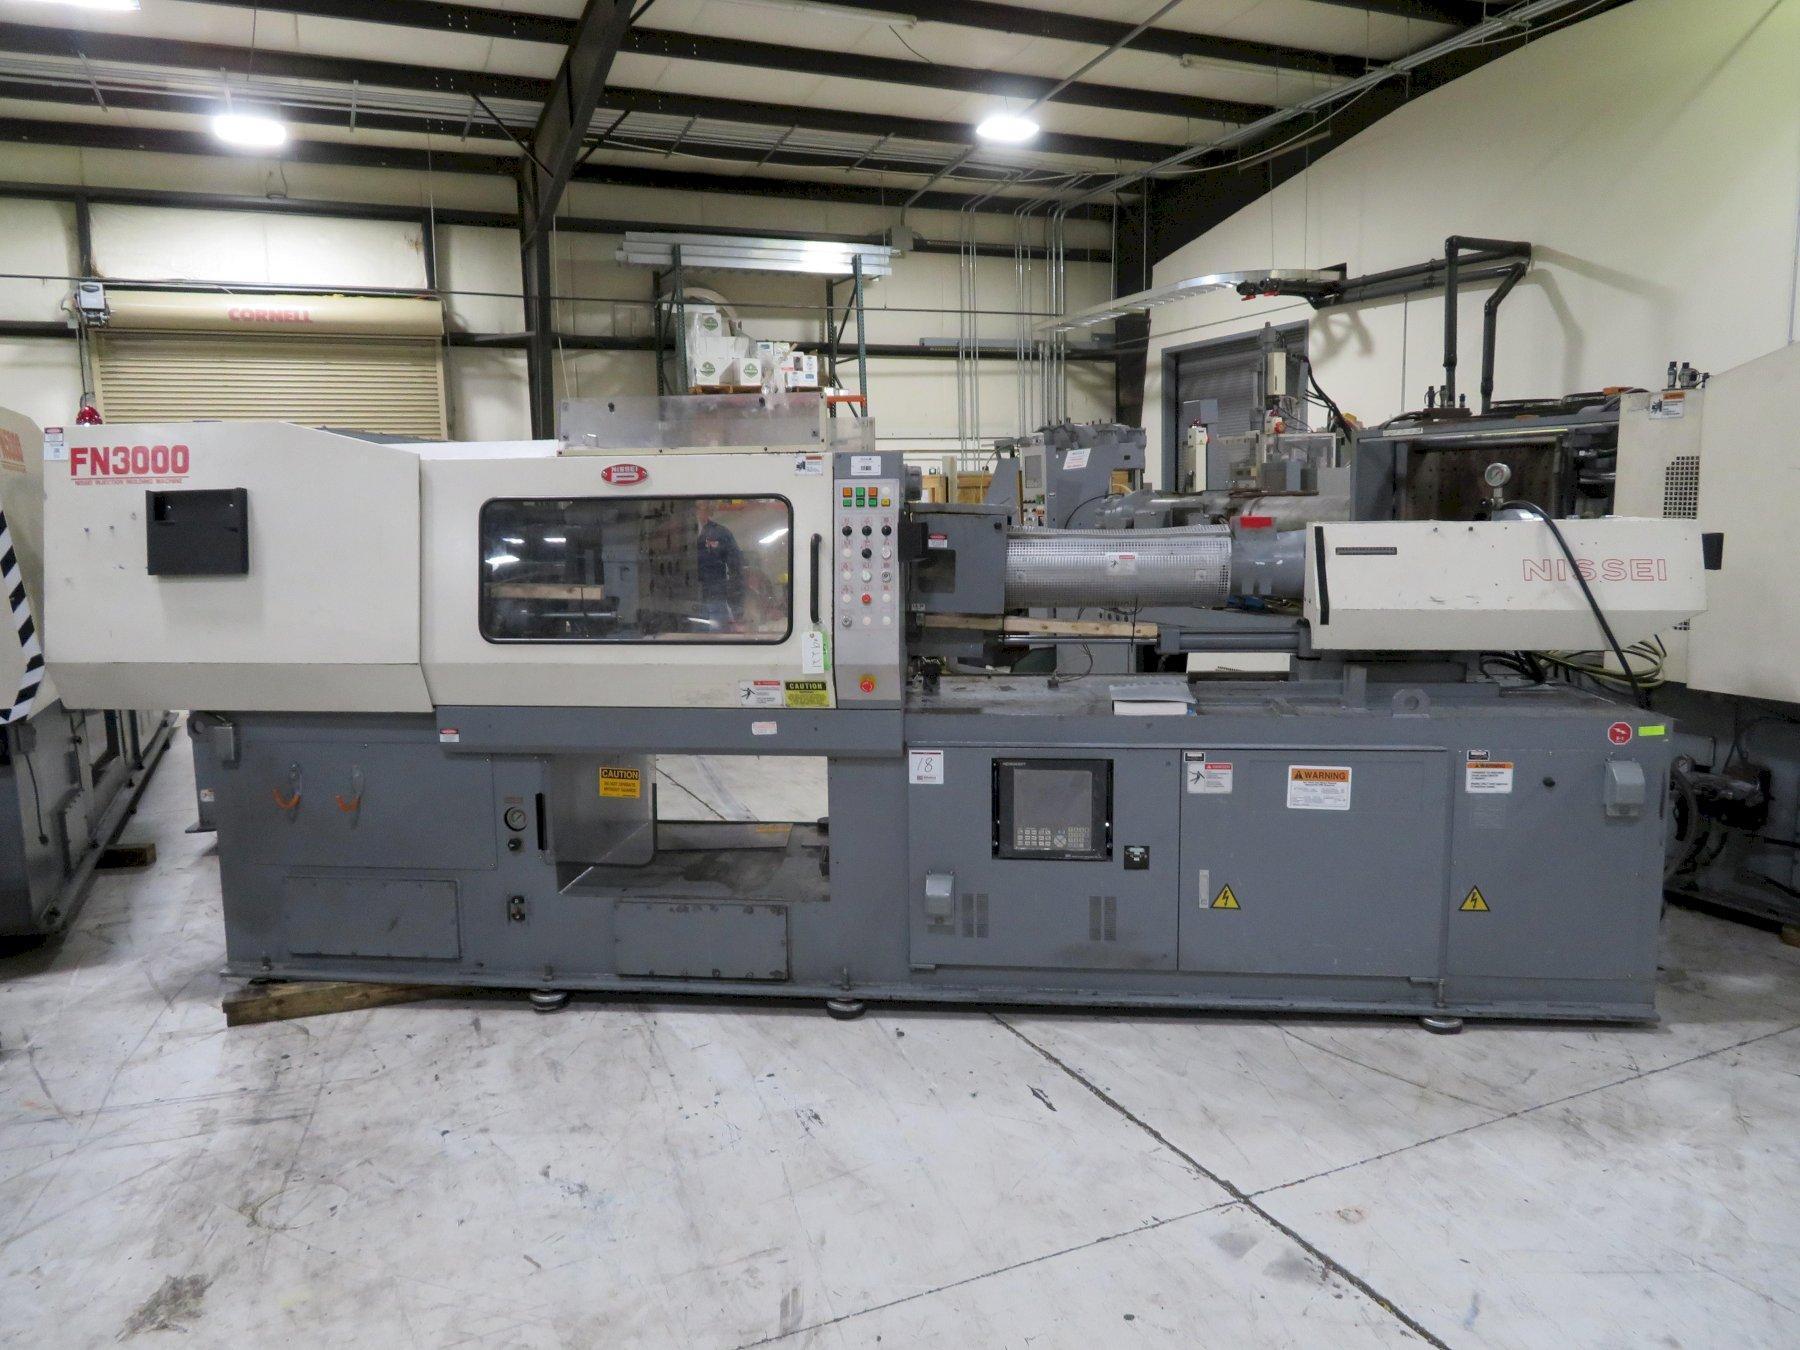 Nissei Used FN3000-25A Injection Molding Machine, 154 US ton, Yr. 2000, 10.5 oz. 460V